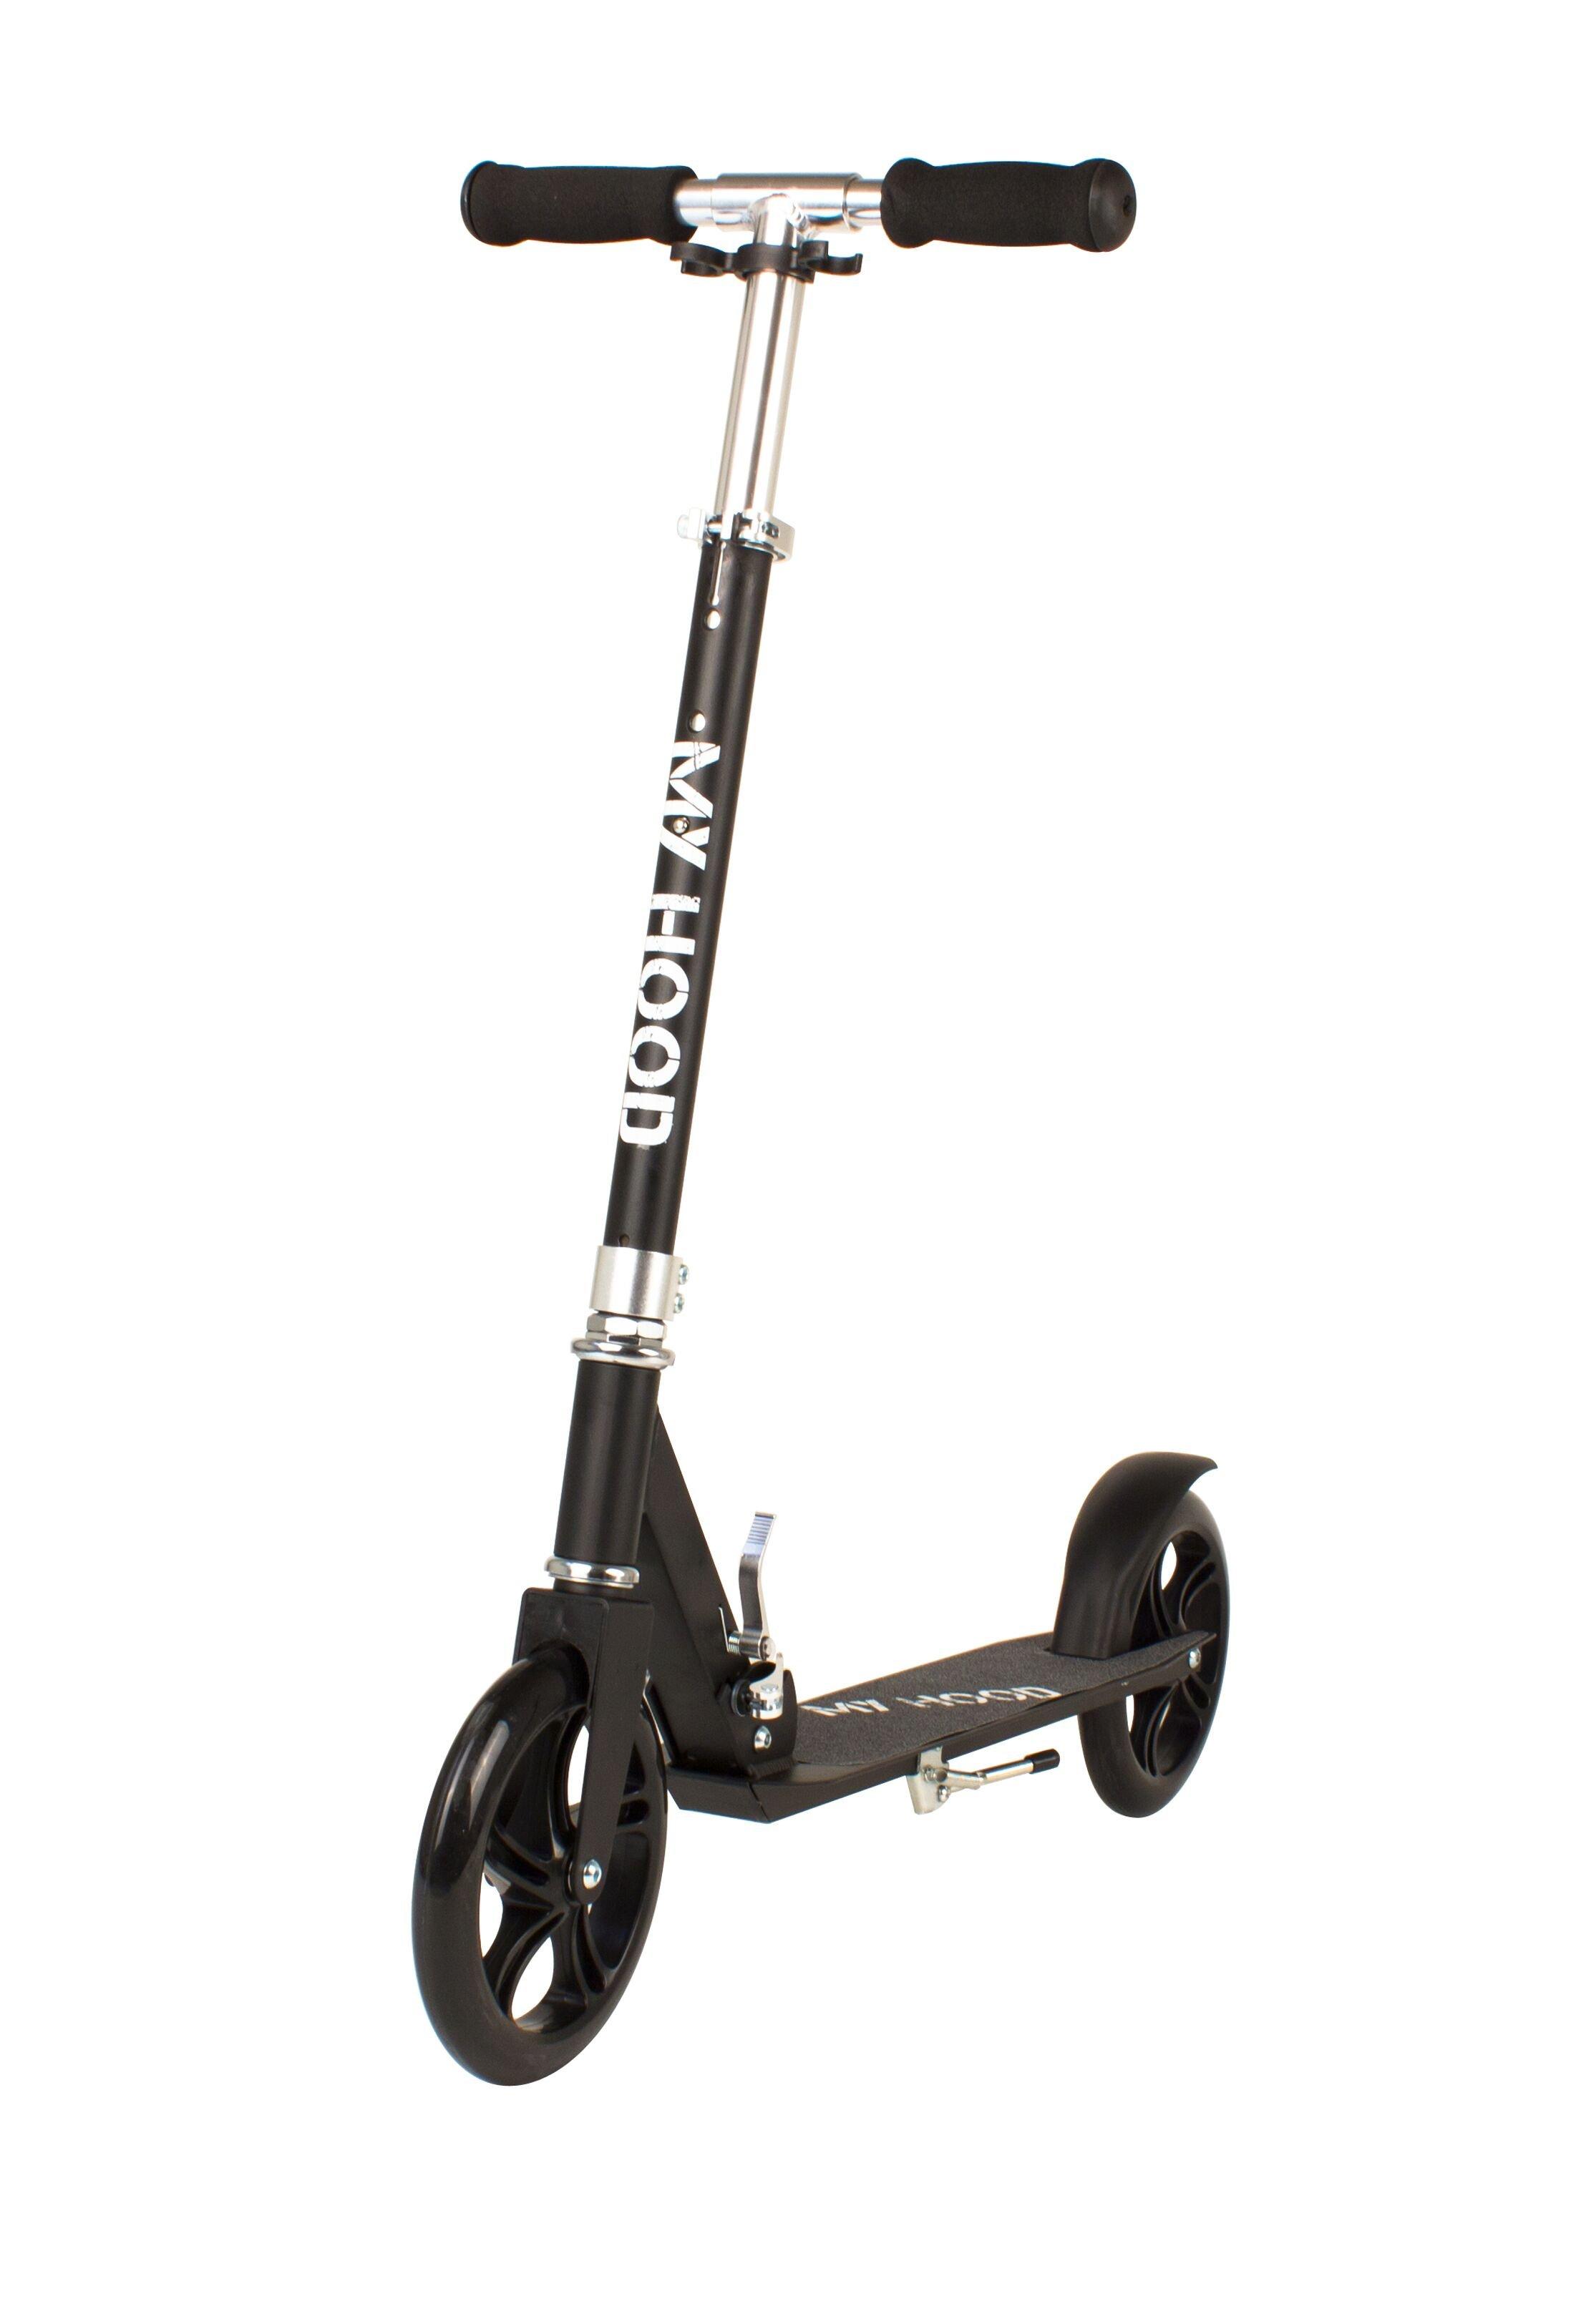 My Hood - Scooter 200 - Black (505155)